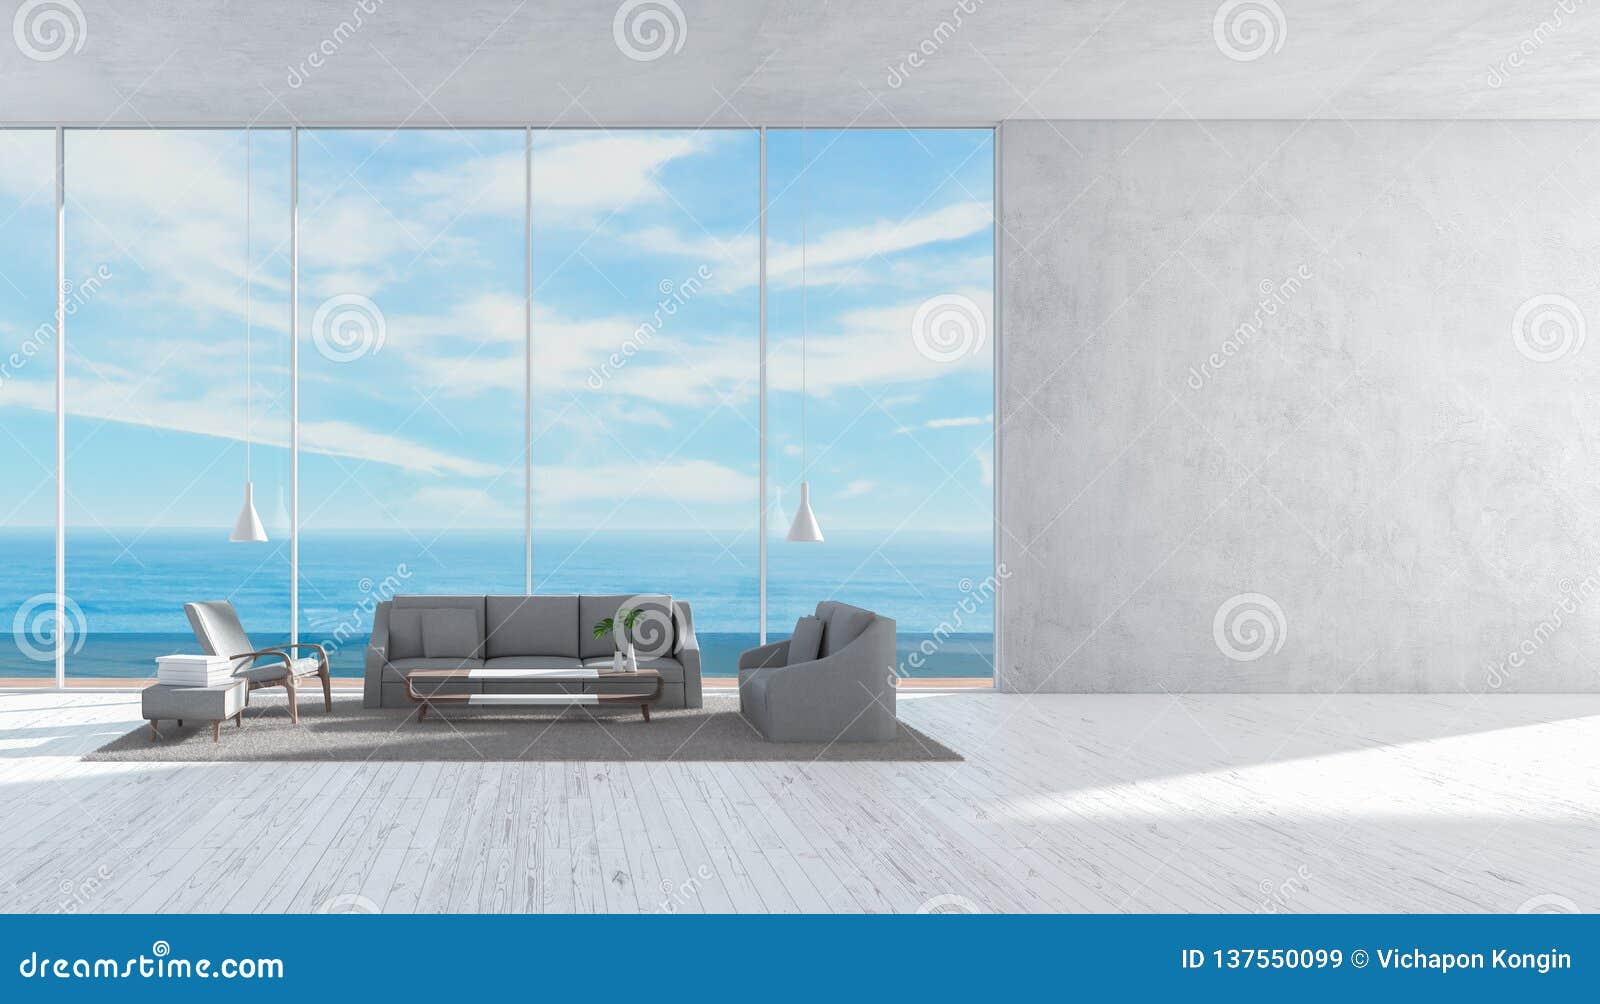 Modern interior living room wood floor sofa set sea view summer 3d rendering wall for mockup template